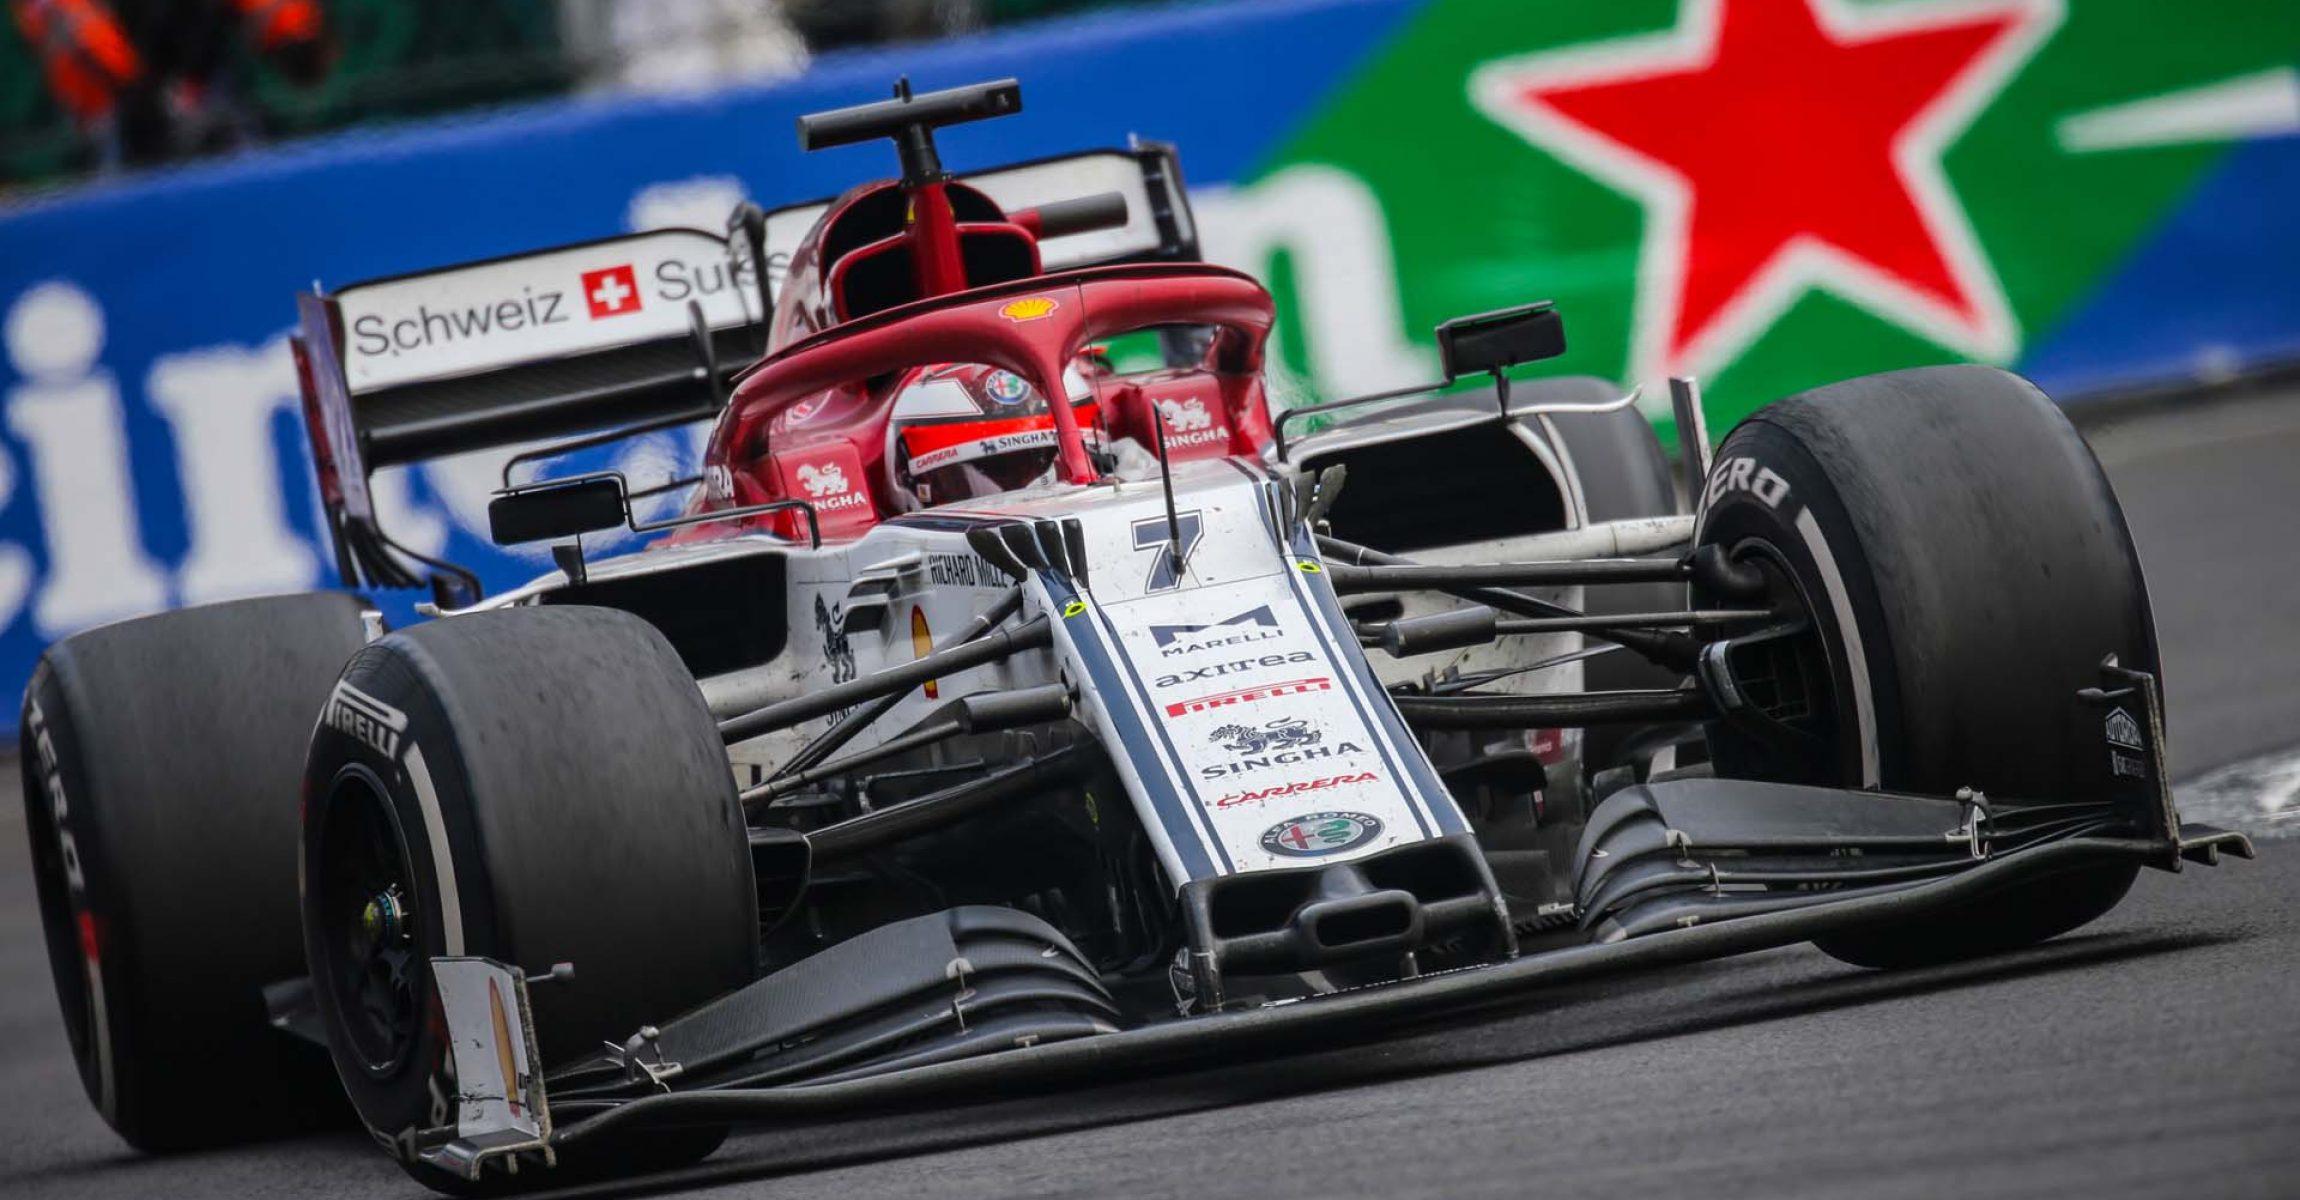 07 RAIKKONEN Kimi Räikkönen (fin), Alfa Romeo Racing C38, action during the 2019 Formula One World Championship, Mexico Grand Prix from october 24 to 27 in Mexico - Photo Francois Flamand / DPPI